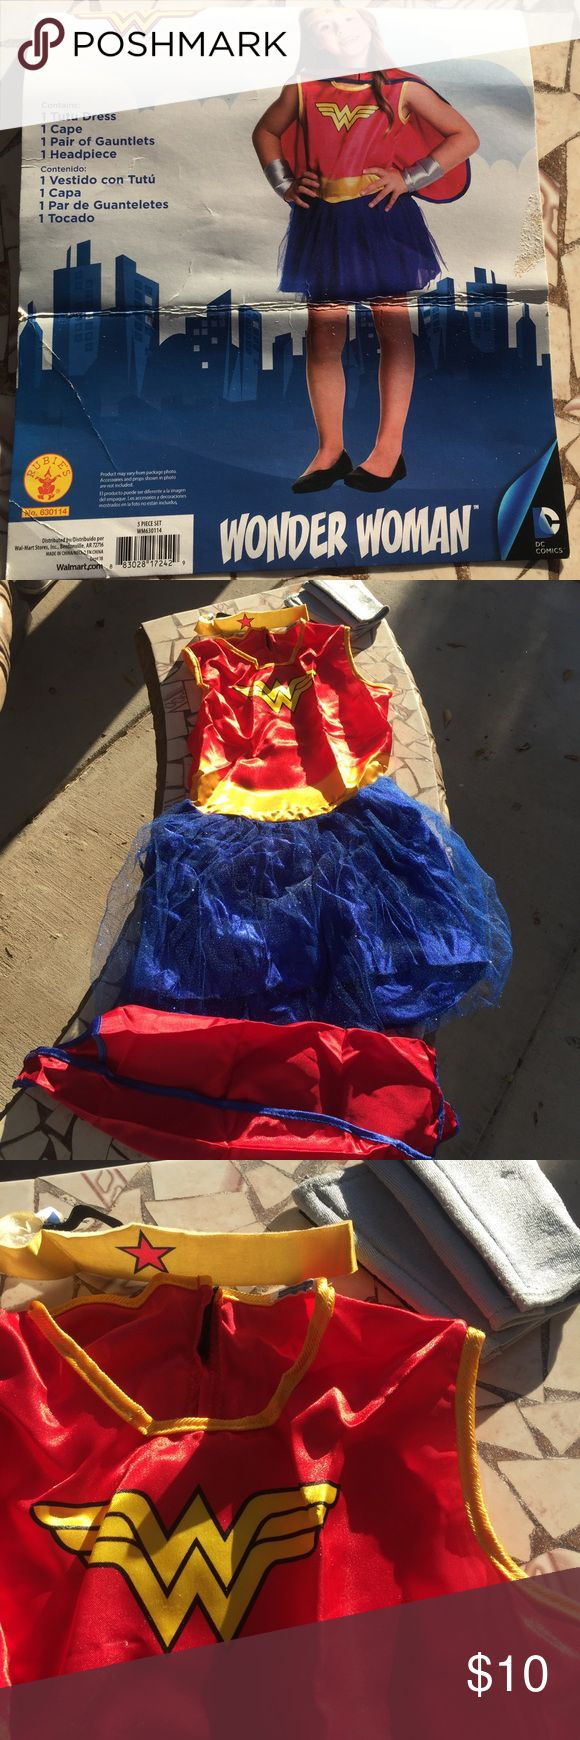 Wonder Woman girls medium Girls Wonder Woman costume size medium 8-10 comes with tutu dress, 1 cape, 1 pair of Gauntlets, 1 head piece. Worn once 🌻🎃 Costumes Halloween